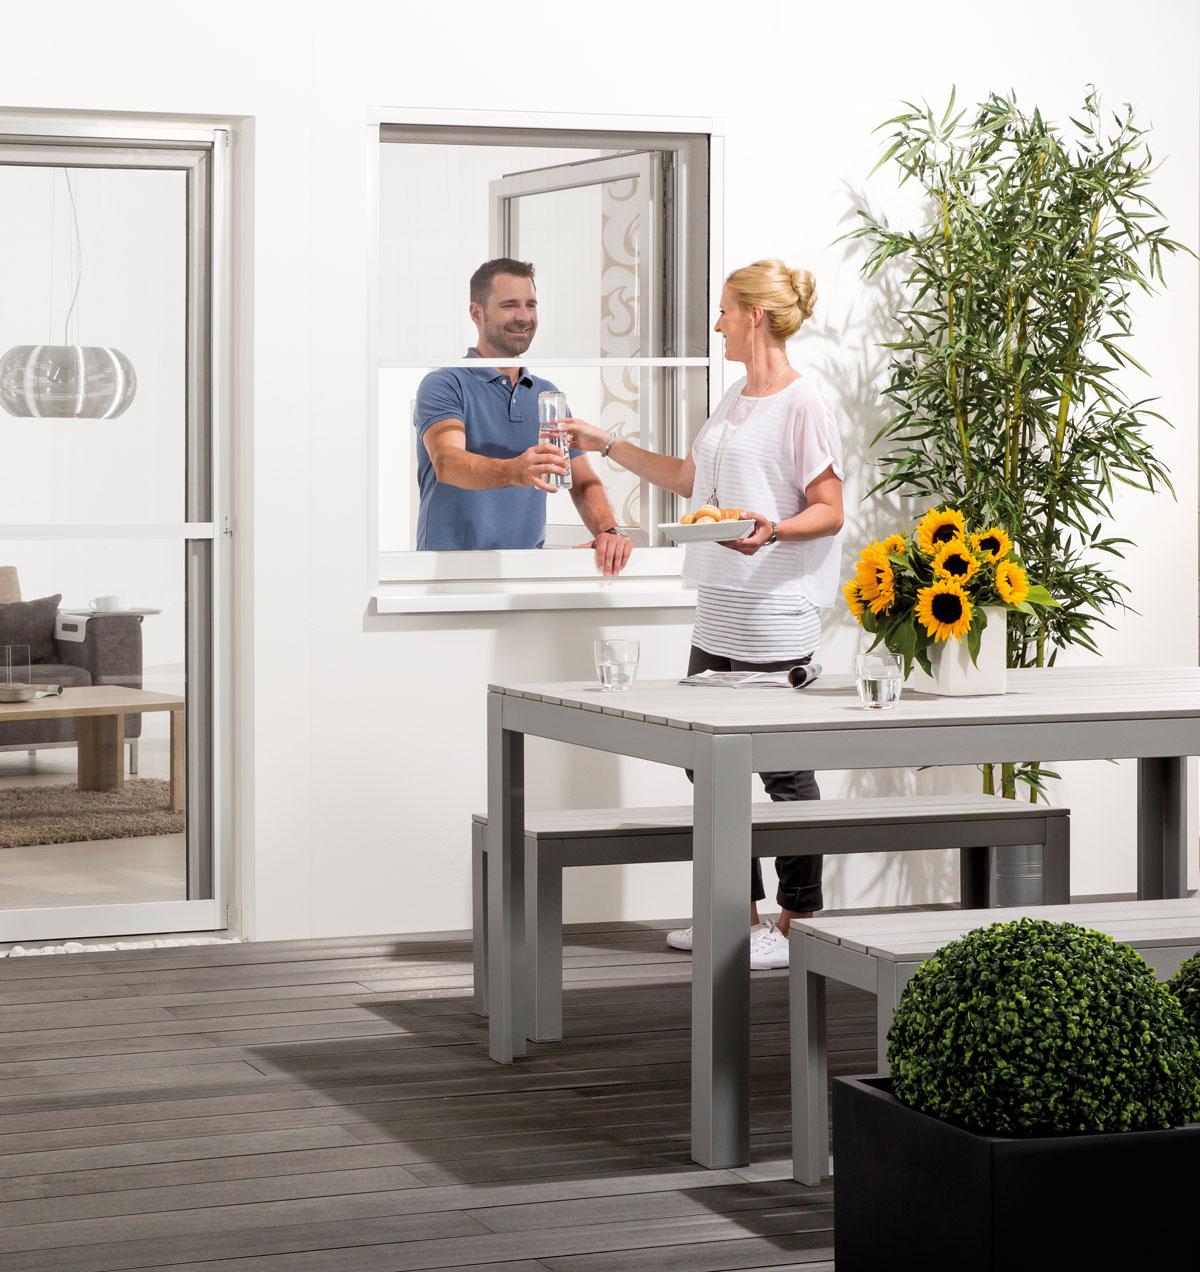 aldi nord fliegengitter fenster rollo weitere. Black Bedroom Furniture Sets. Home Design Ideas